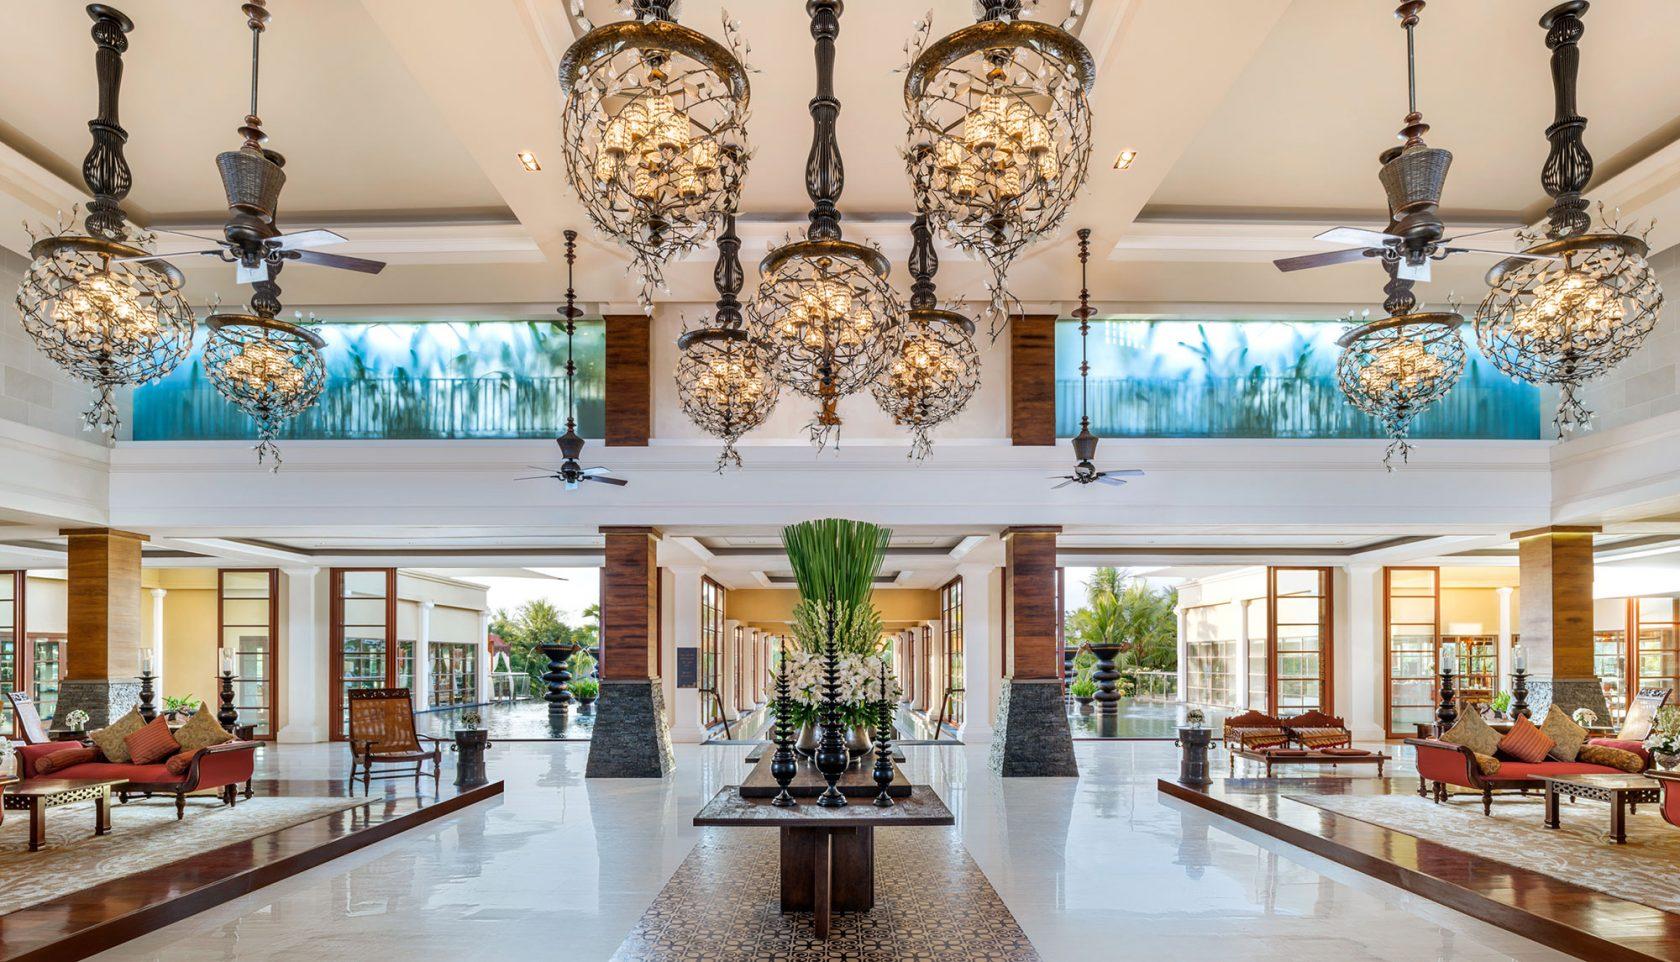 The St. Regis Bali Lobby